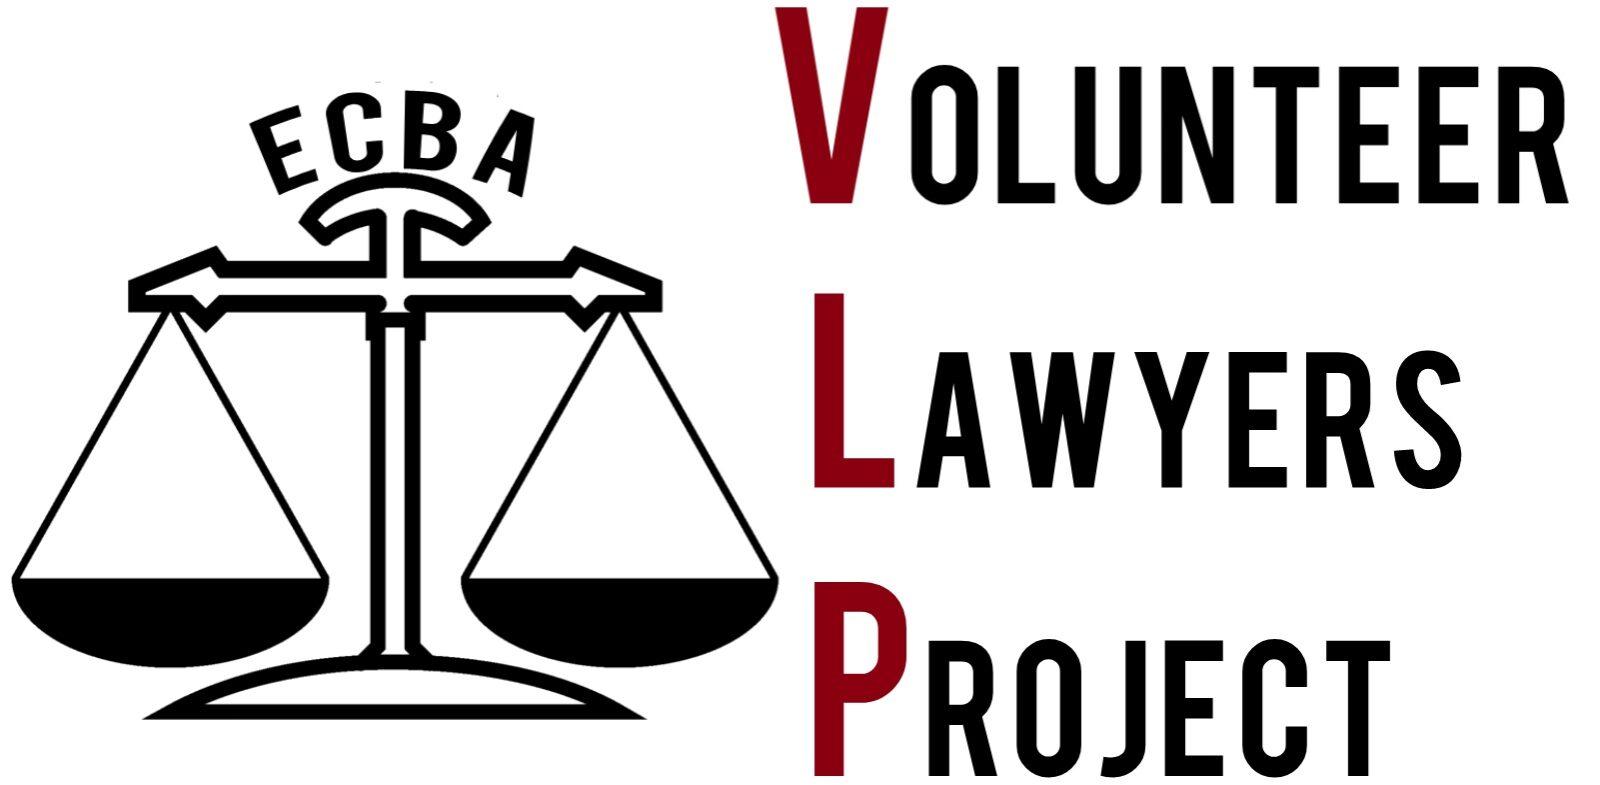 ECBA Volunteer Lawyers Project l Provides Free Legal